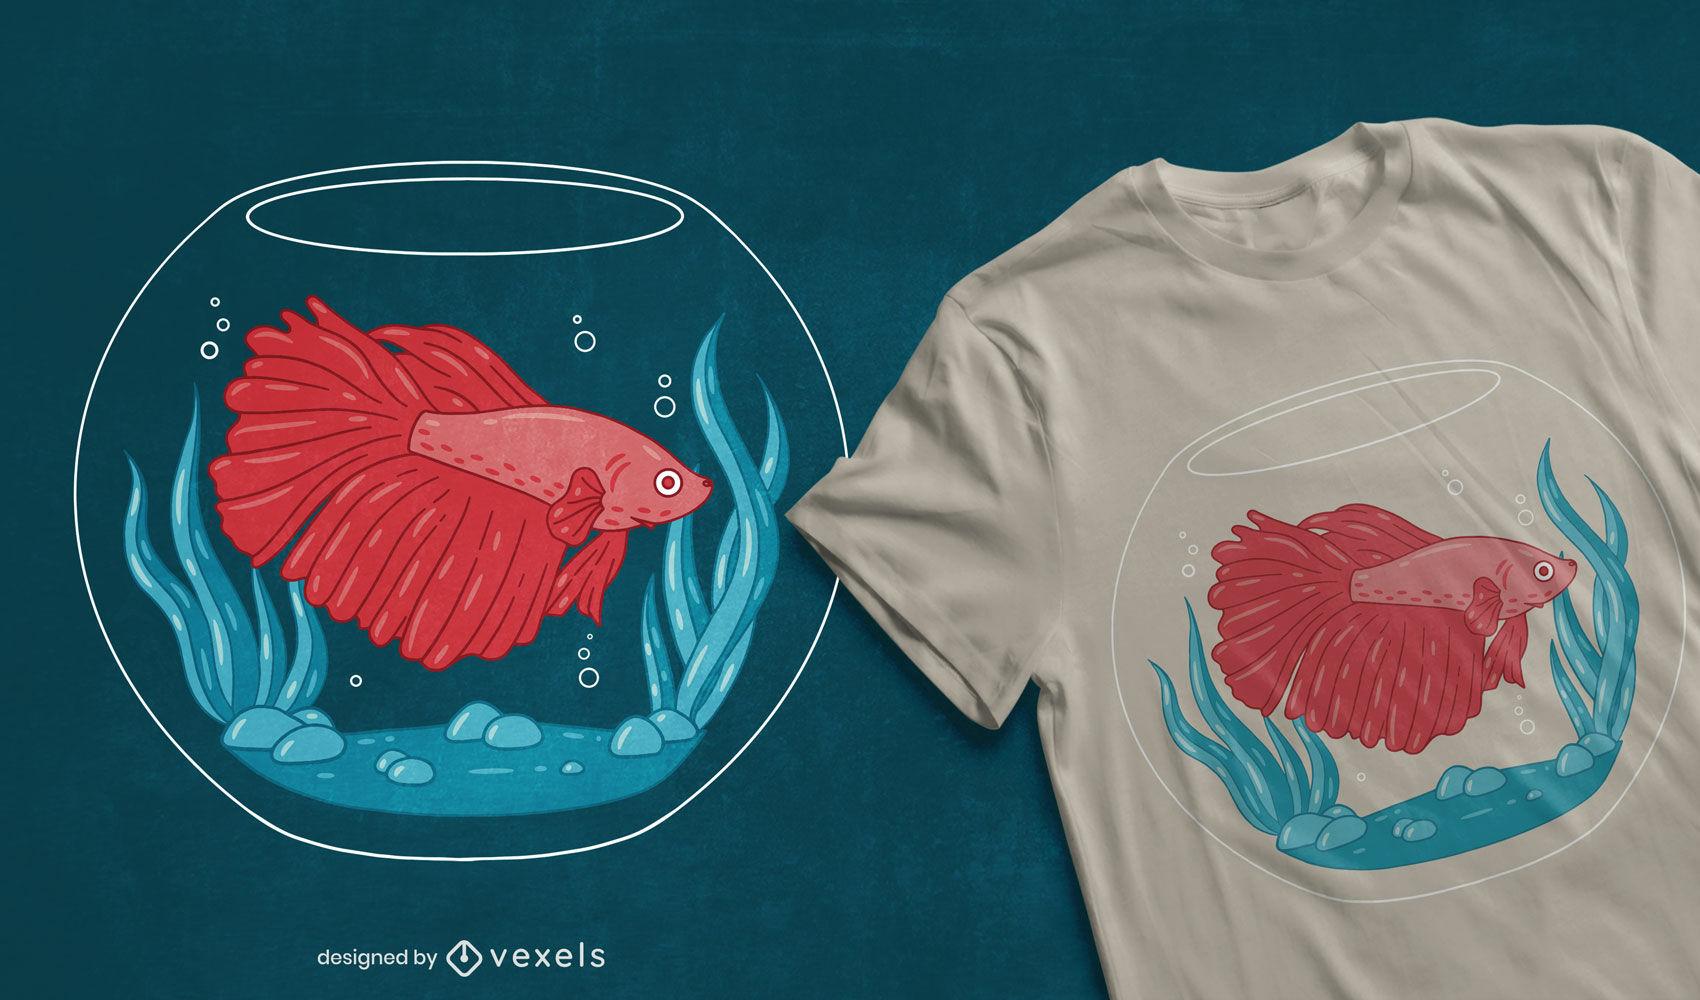 Fish in fish bowl t-shirt design